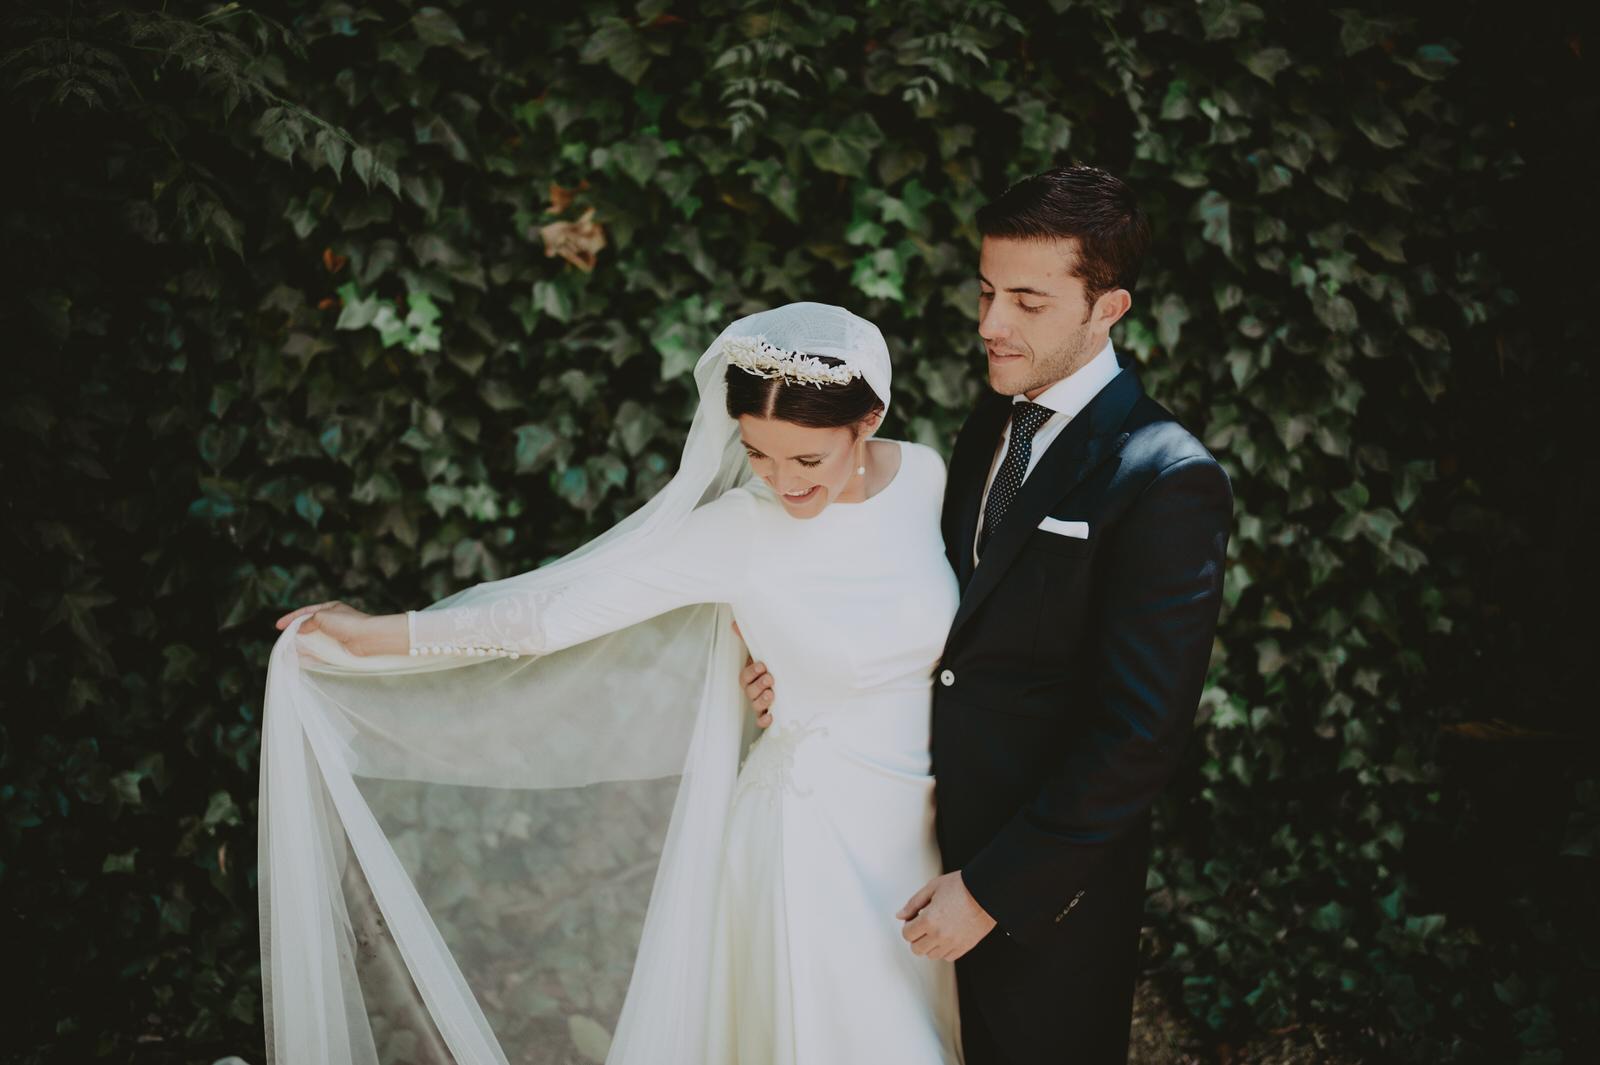 Judith & Gabriel - Boda en Olivares - Albaida, Fotógrafo de boda Andrés Amarillo - 41.JPG